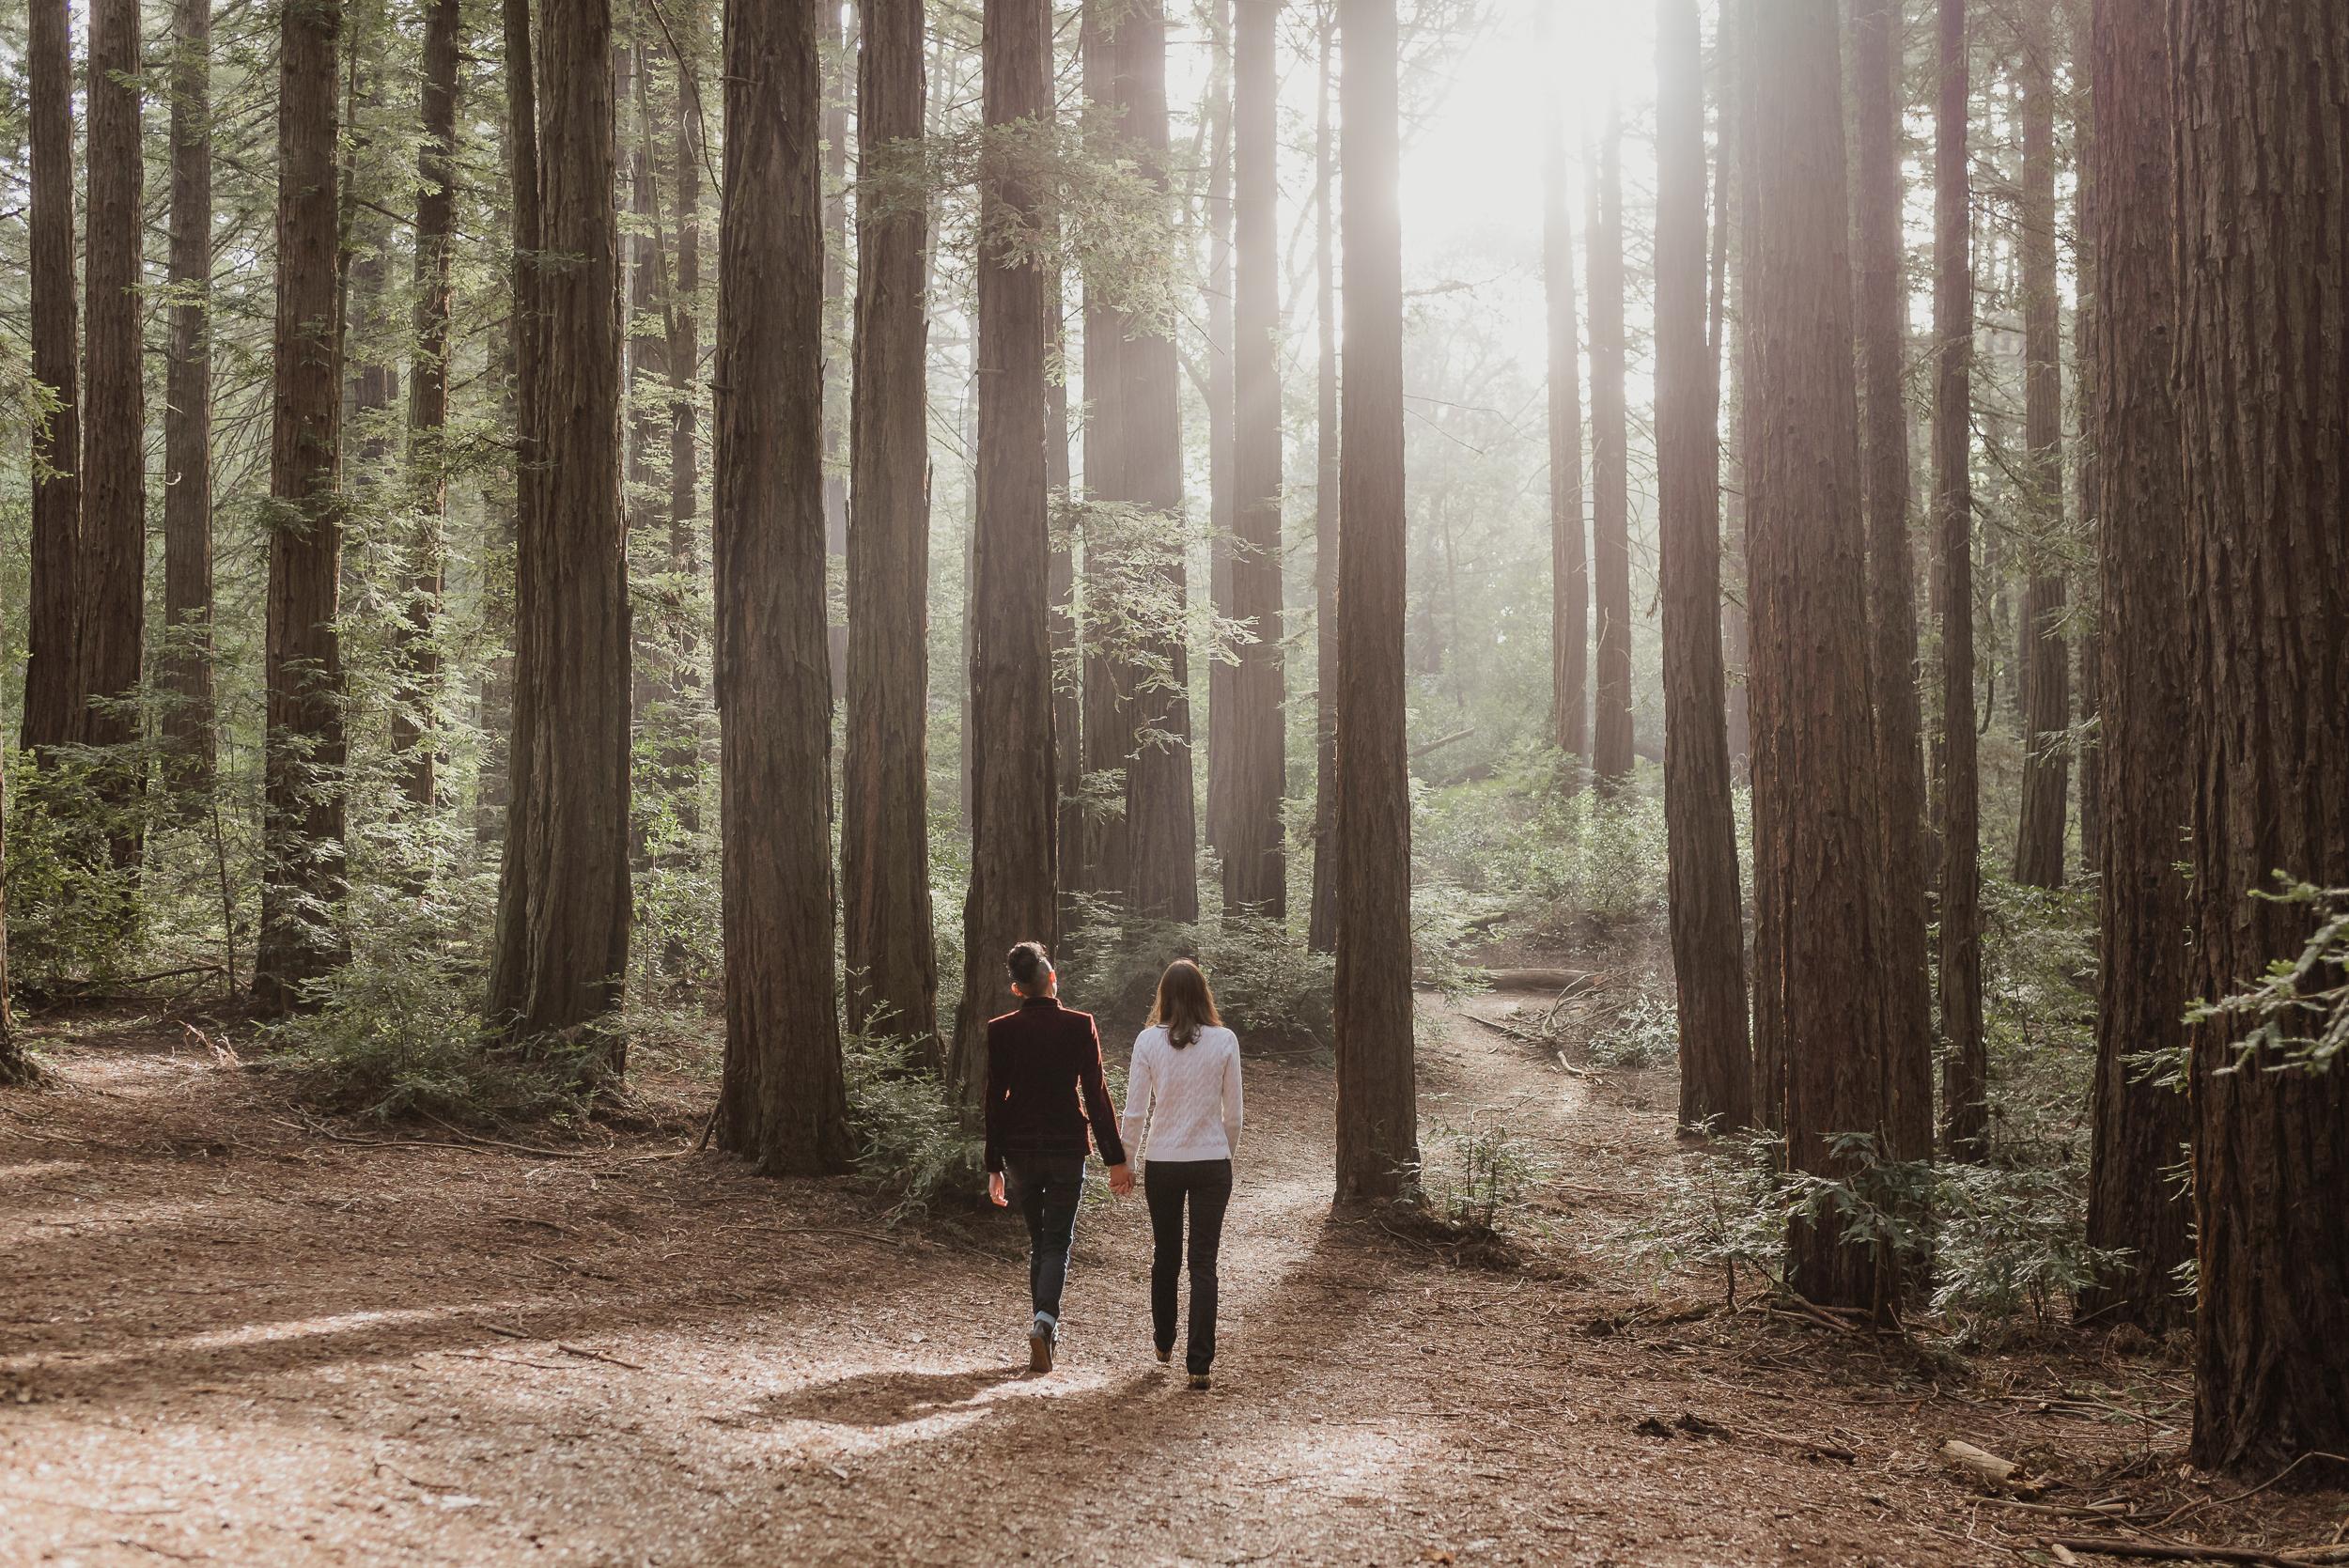 Redwood Regional Park/Joaquin Miller Park, Oakland